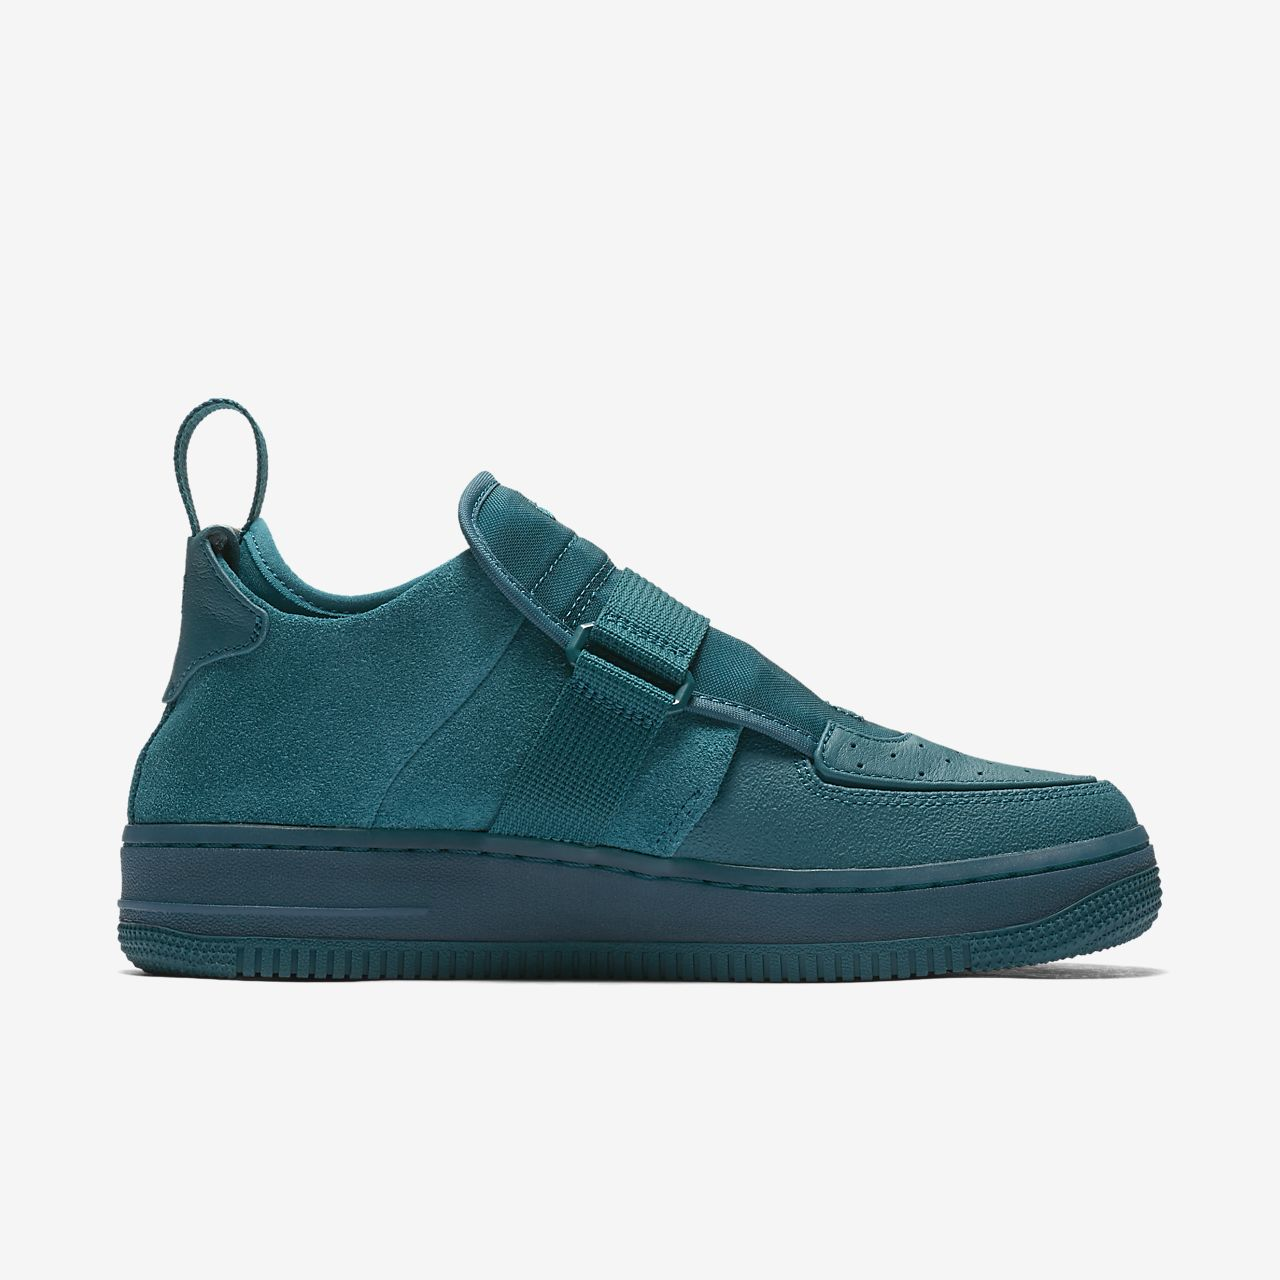 3475a5bc97b4b Nike AF1 Explorer XX Women's Shoe. Nike.com CA